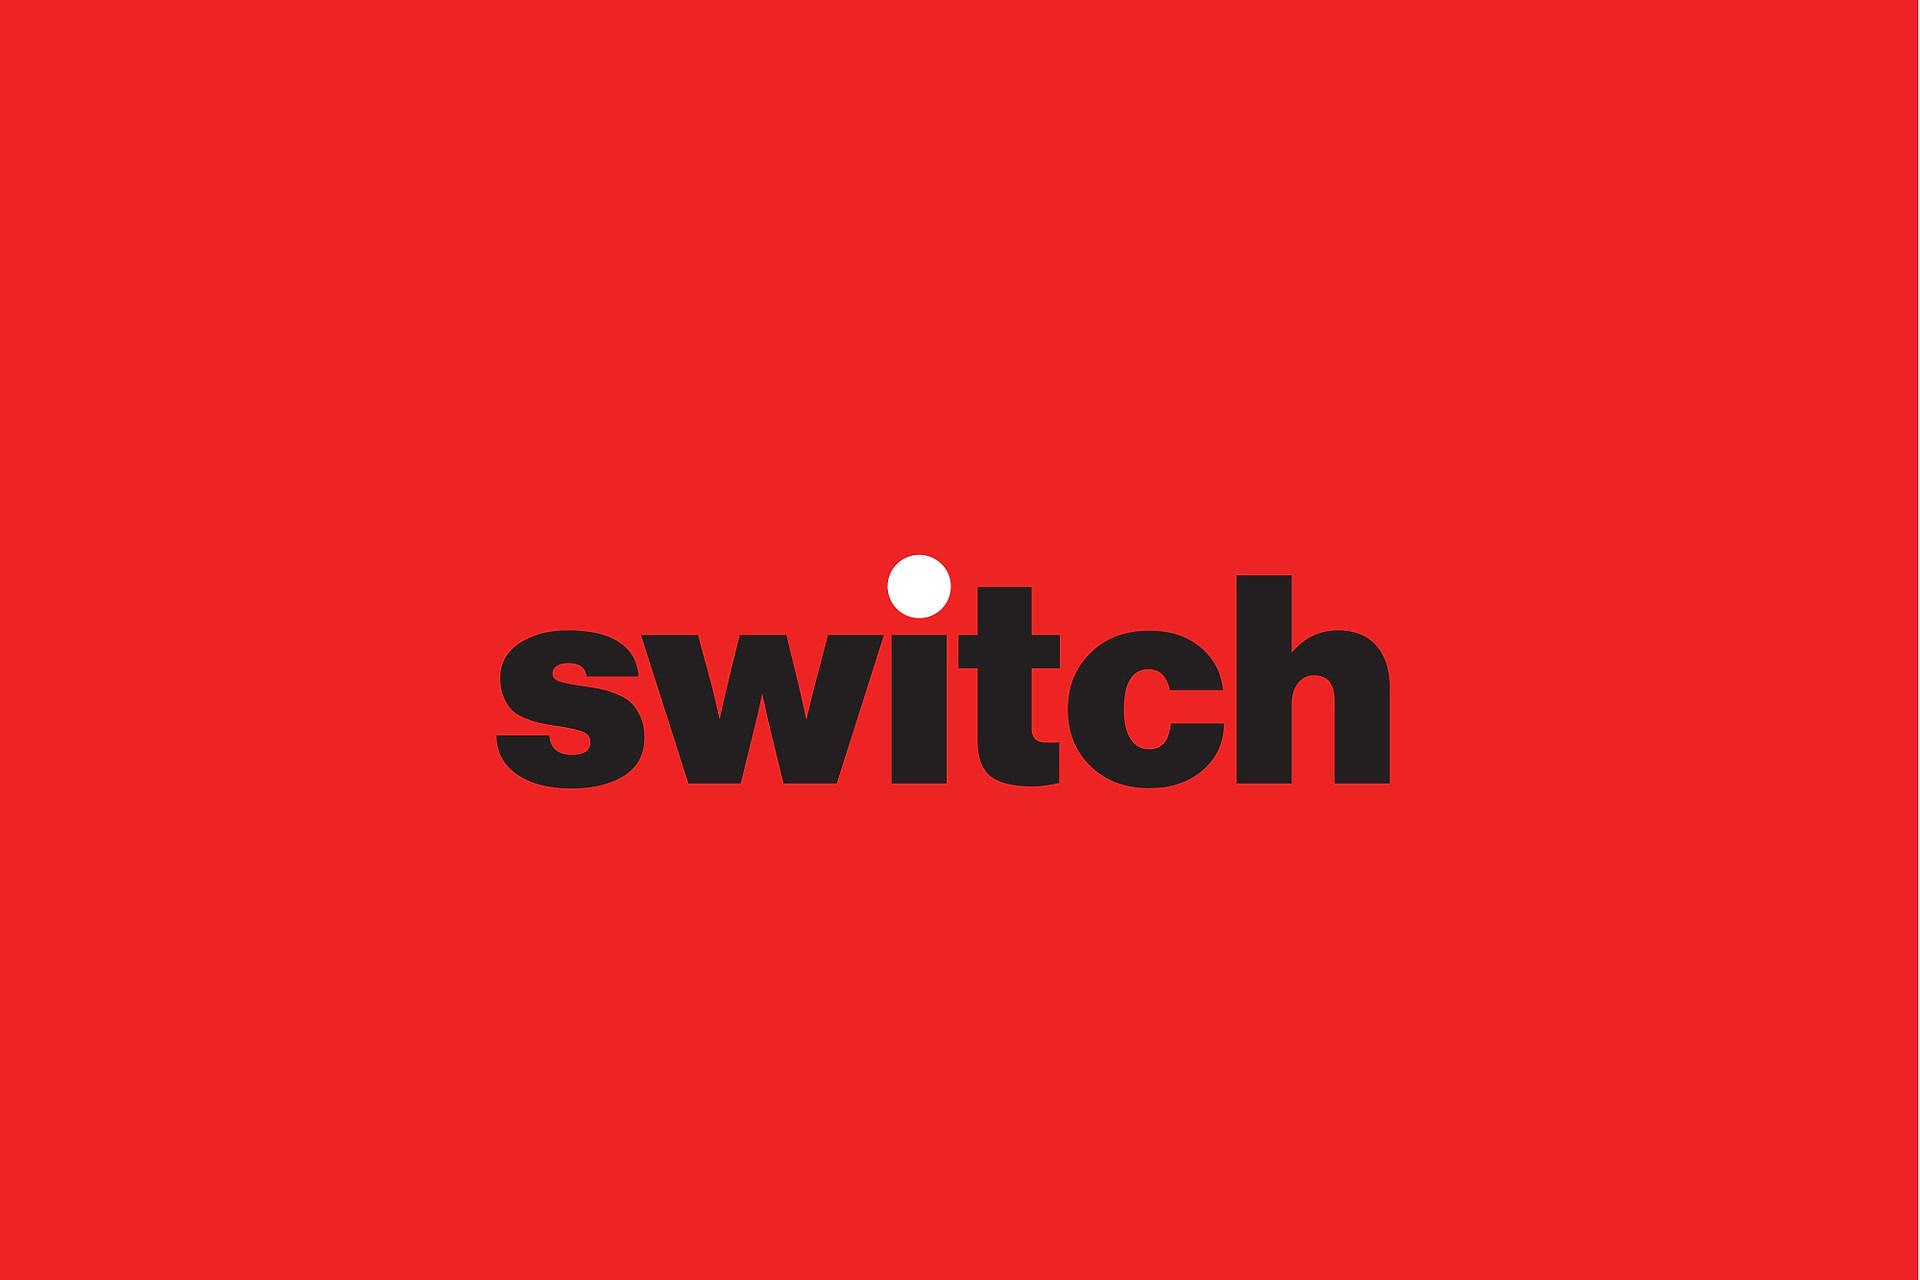 Switch-Mobile-logo20-copy-2.jpg